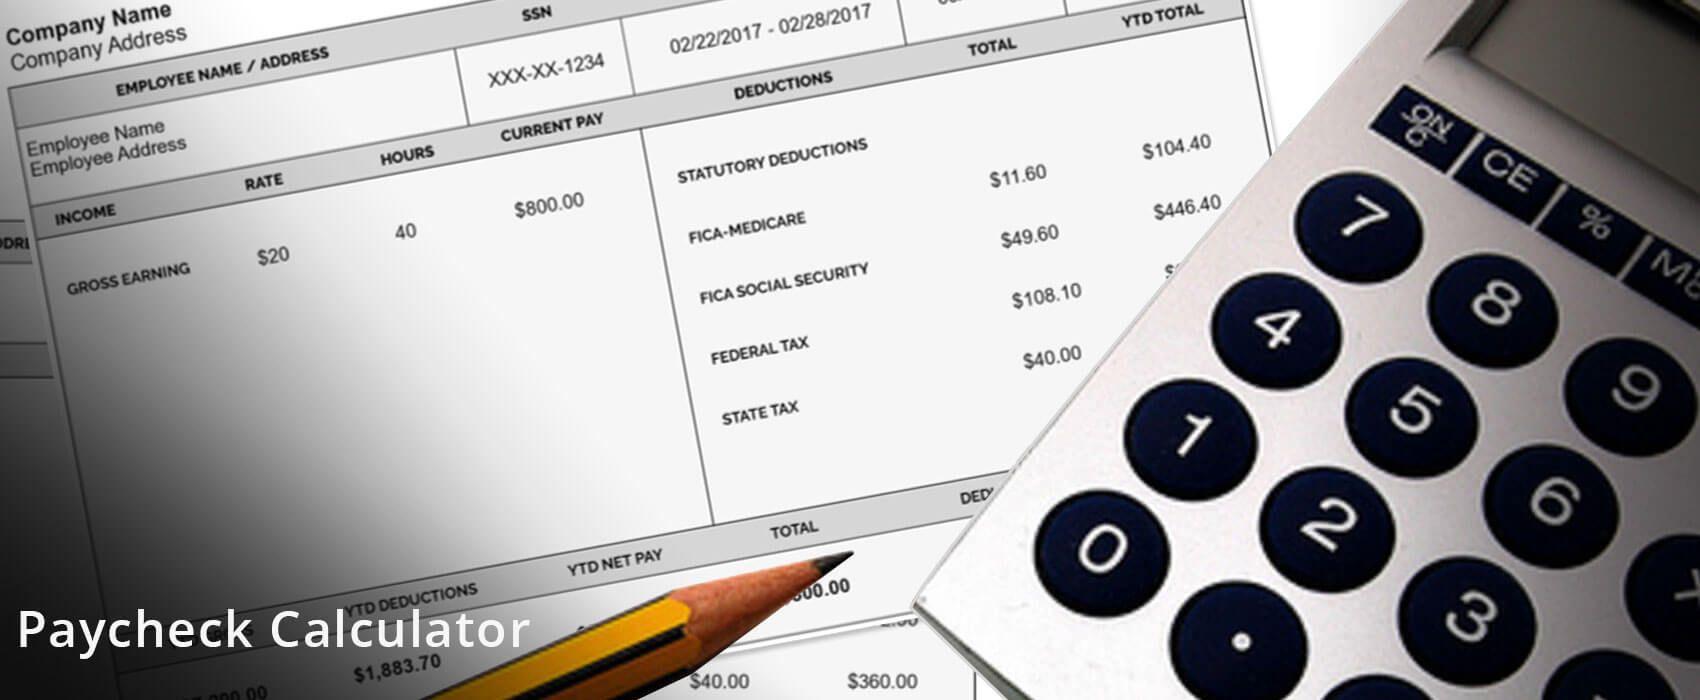 Paycheck calculator paycheck calculator payroll